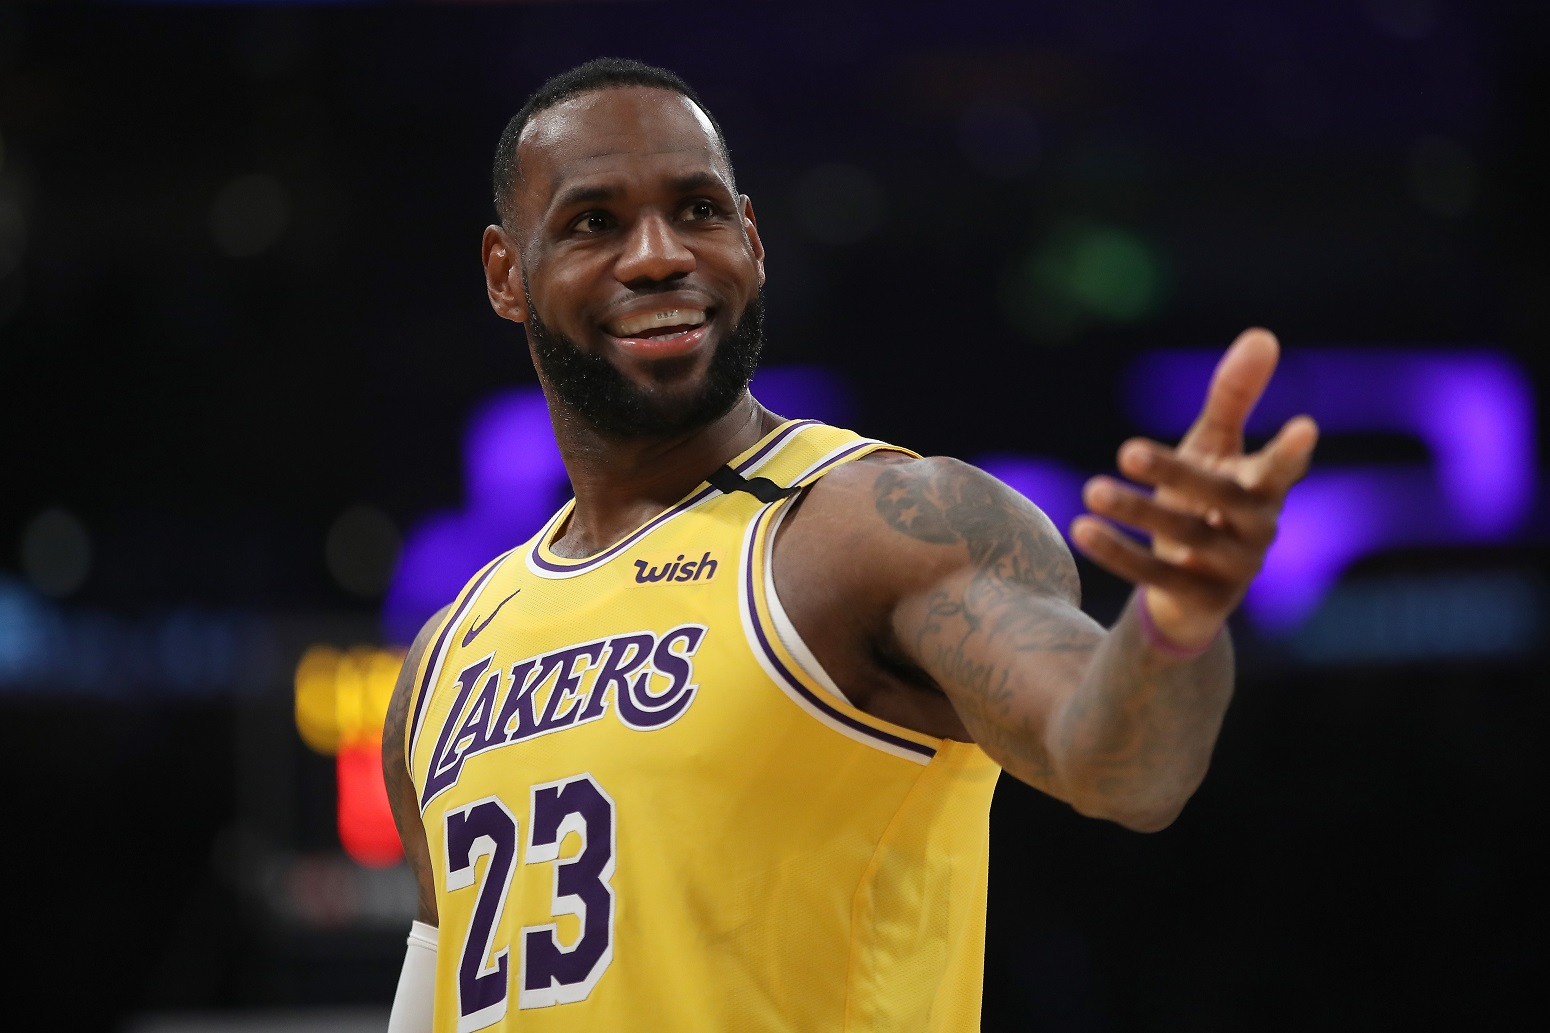 LeBron James legal trademark battle heat owner Micky Arison